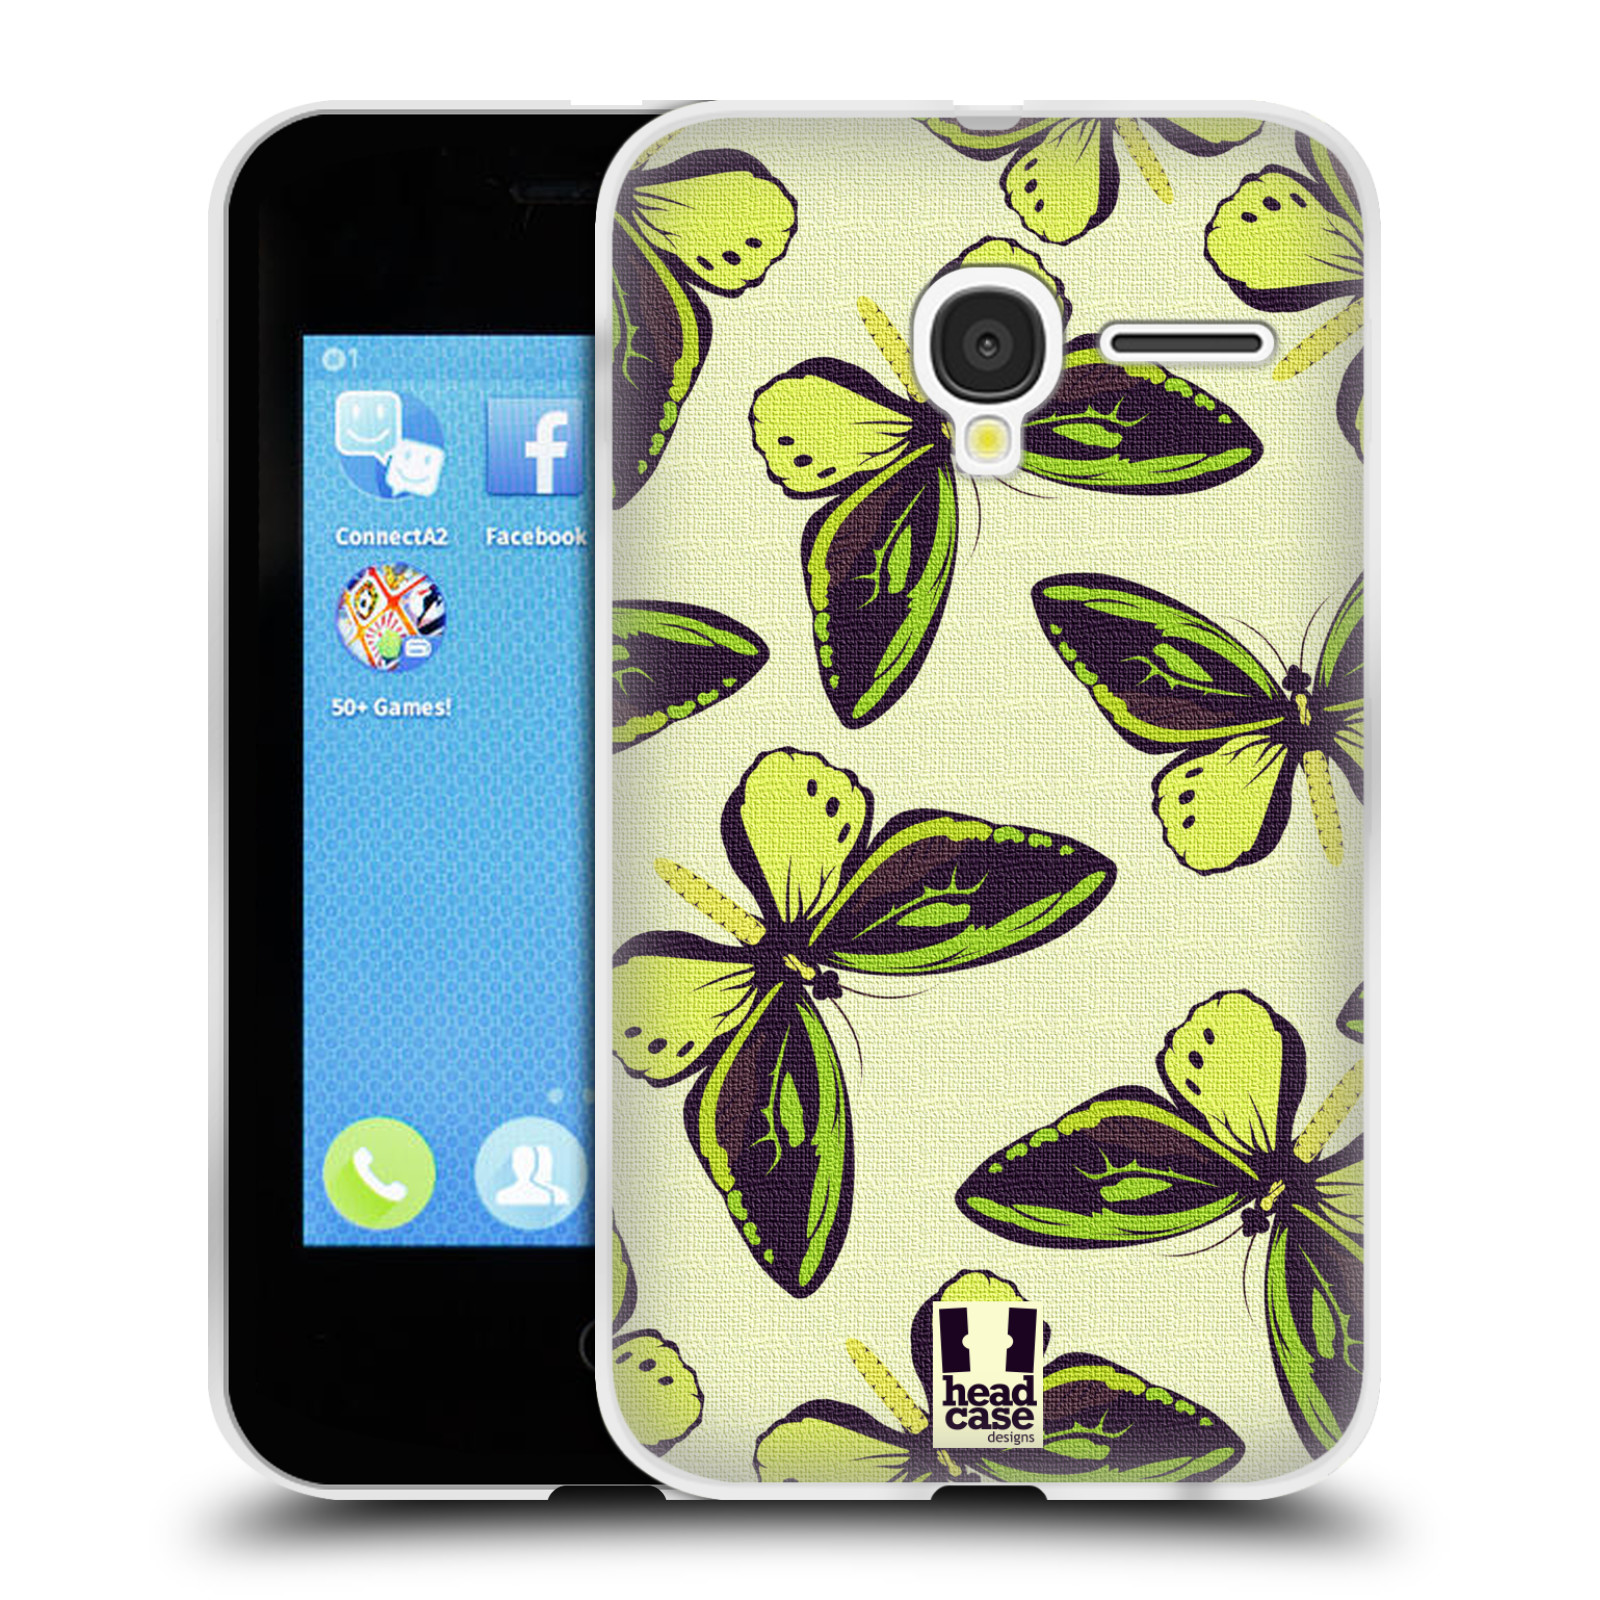 HEAD CASE silikonový obal na mobil Alcatel PIXI 3 OT-4022D (3,5 palcový displej) vzor Motýlci Poseidon zelená